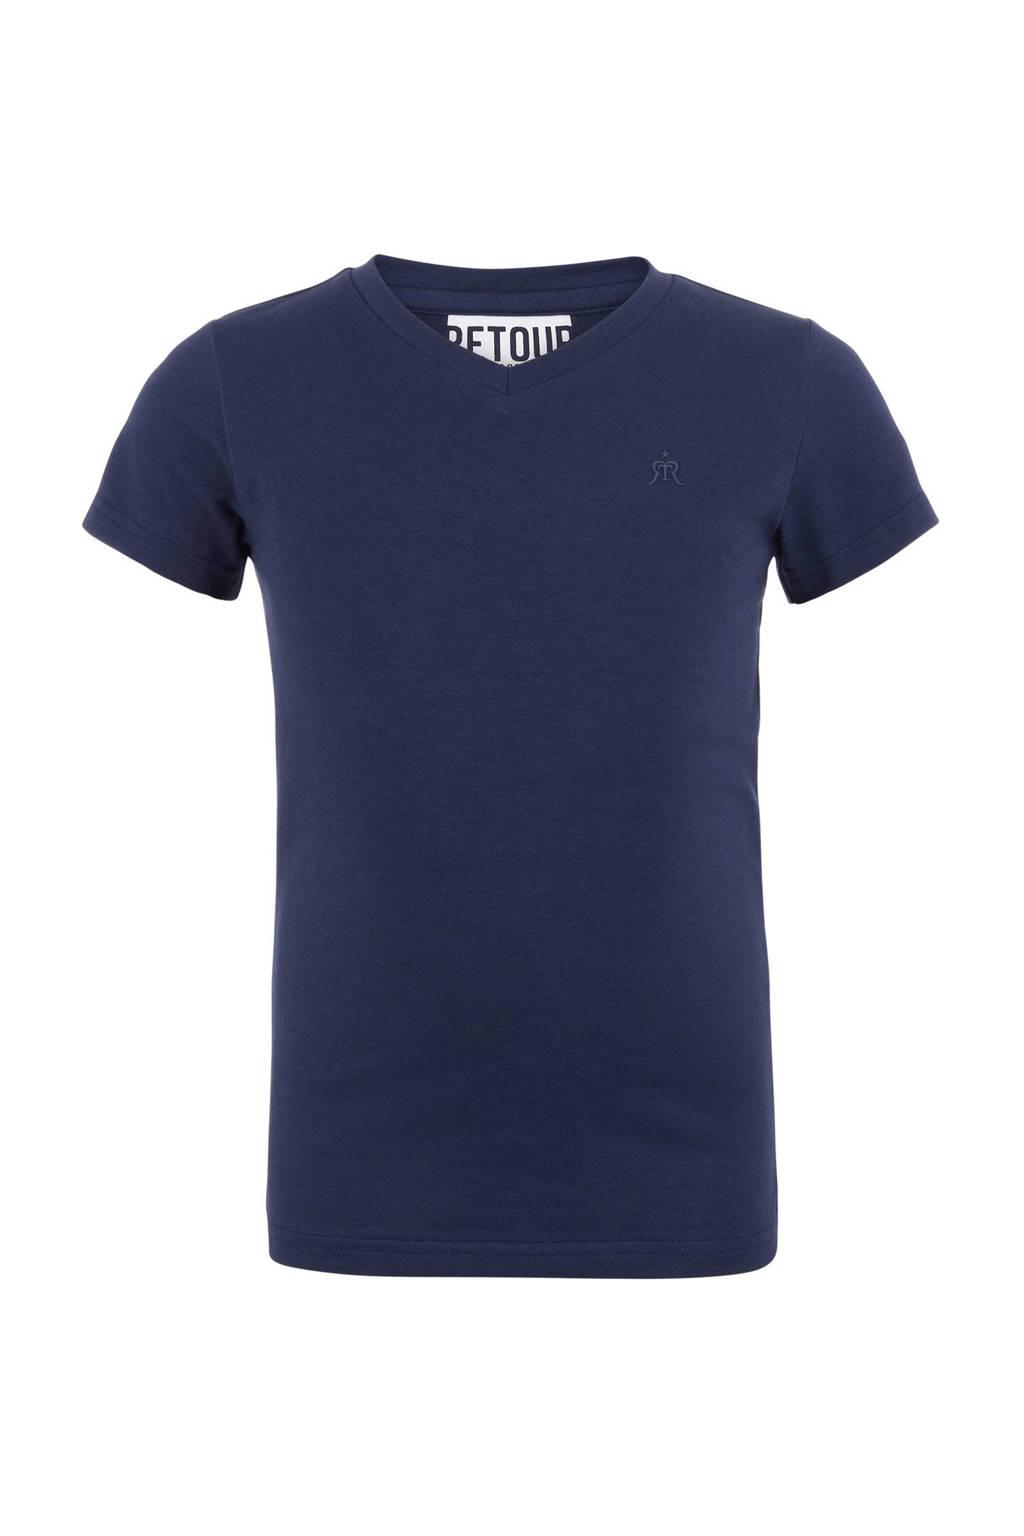 Retour Denim T-shirt Sean donkerblauw, Donkerblauw